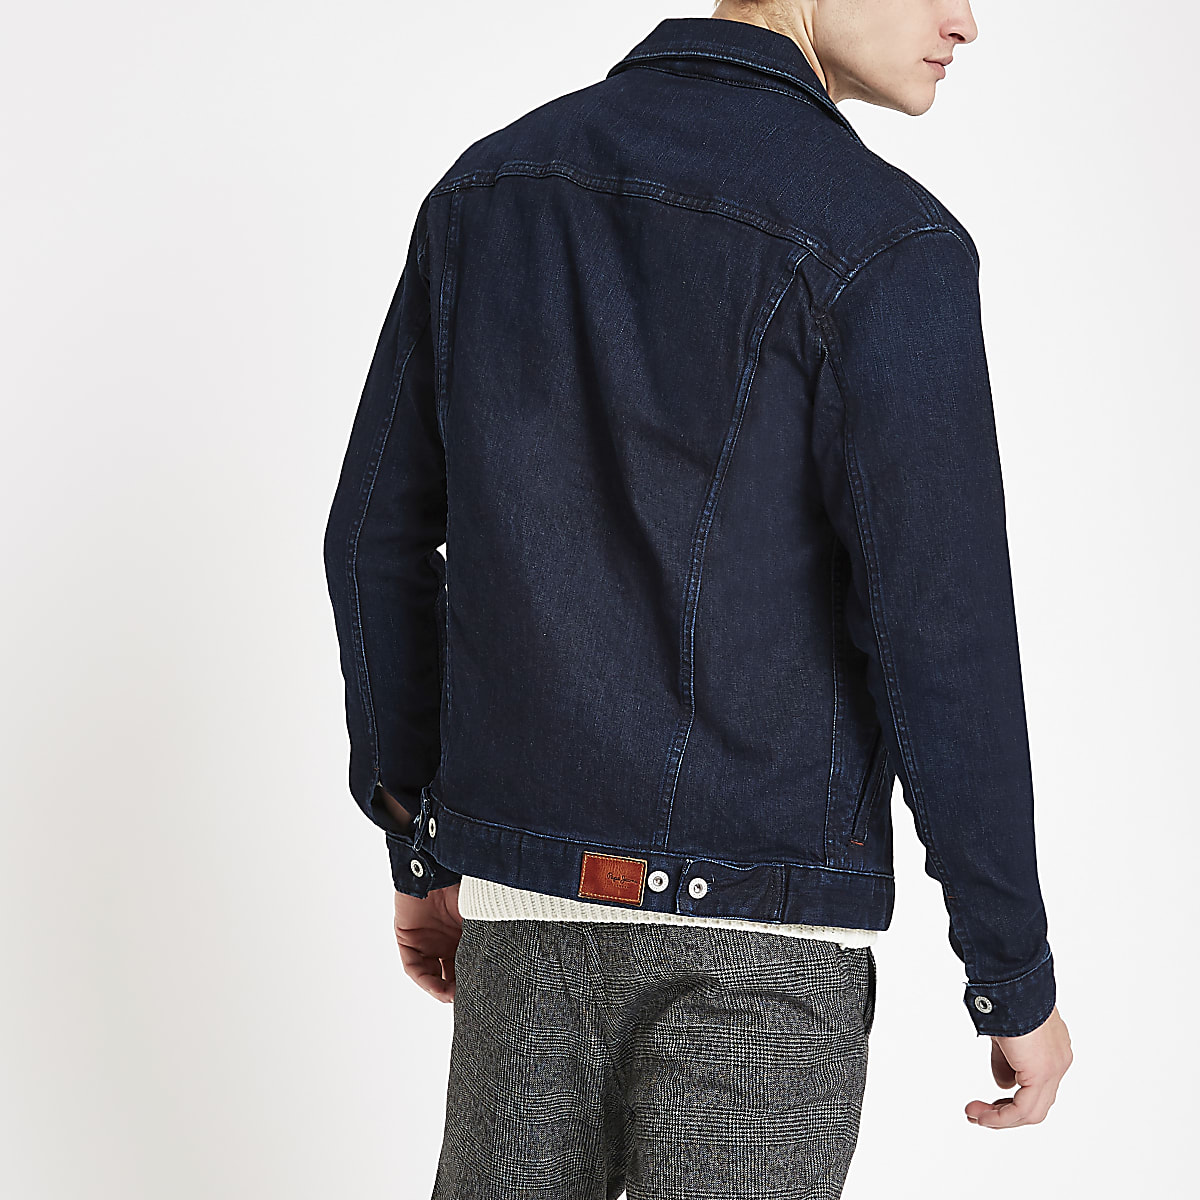 f50cff74f5dc Pepe Jeans dark blue denim jacket - Jackets - Coats & Jackets - men